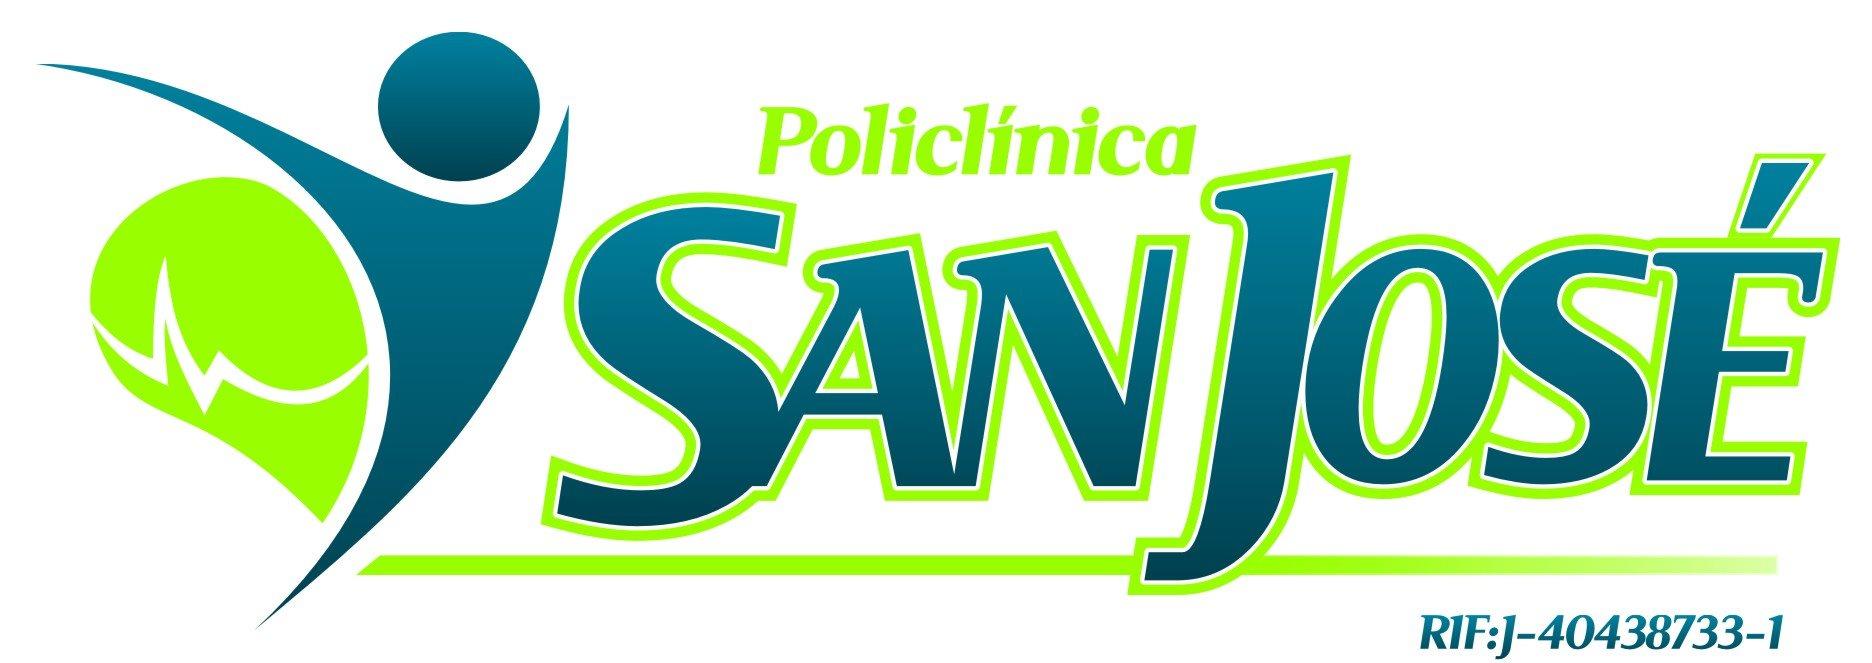 POLICLINICA SAN JOSE, C.A.